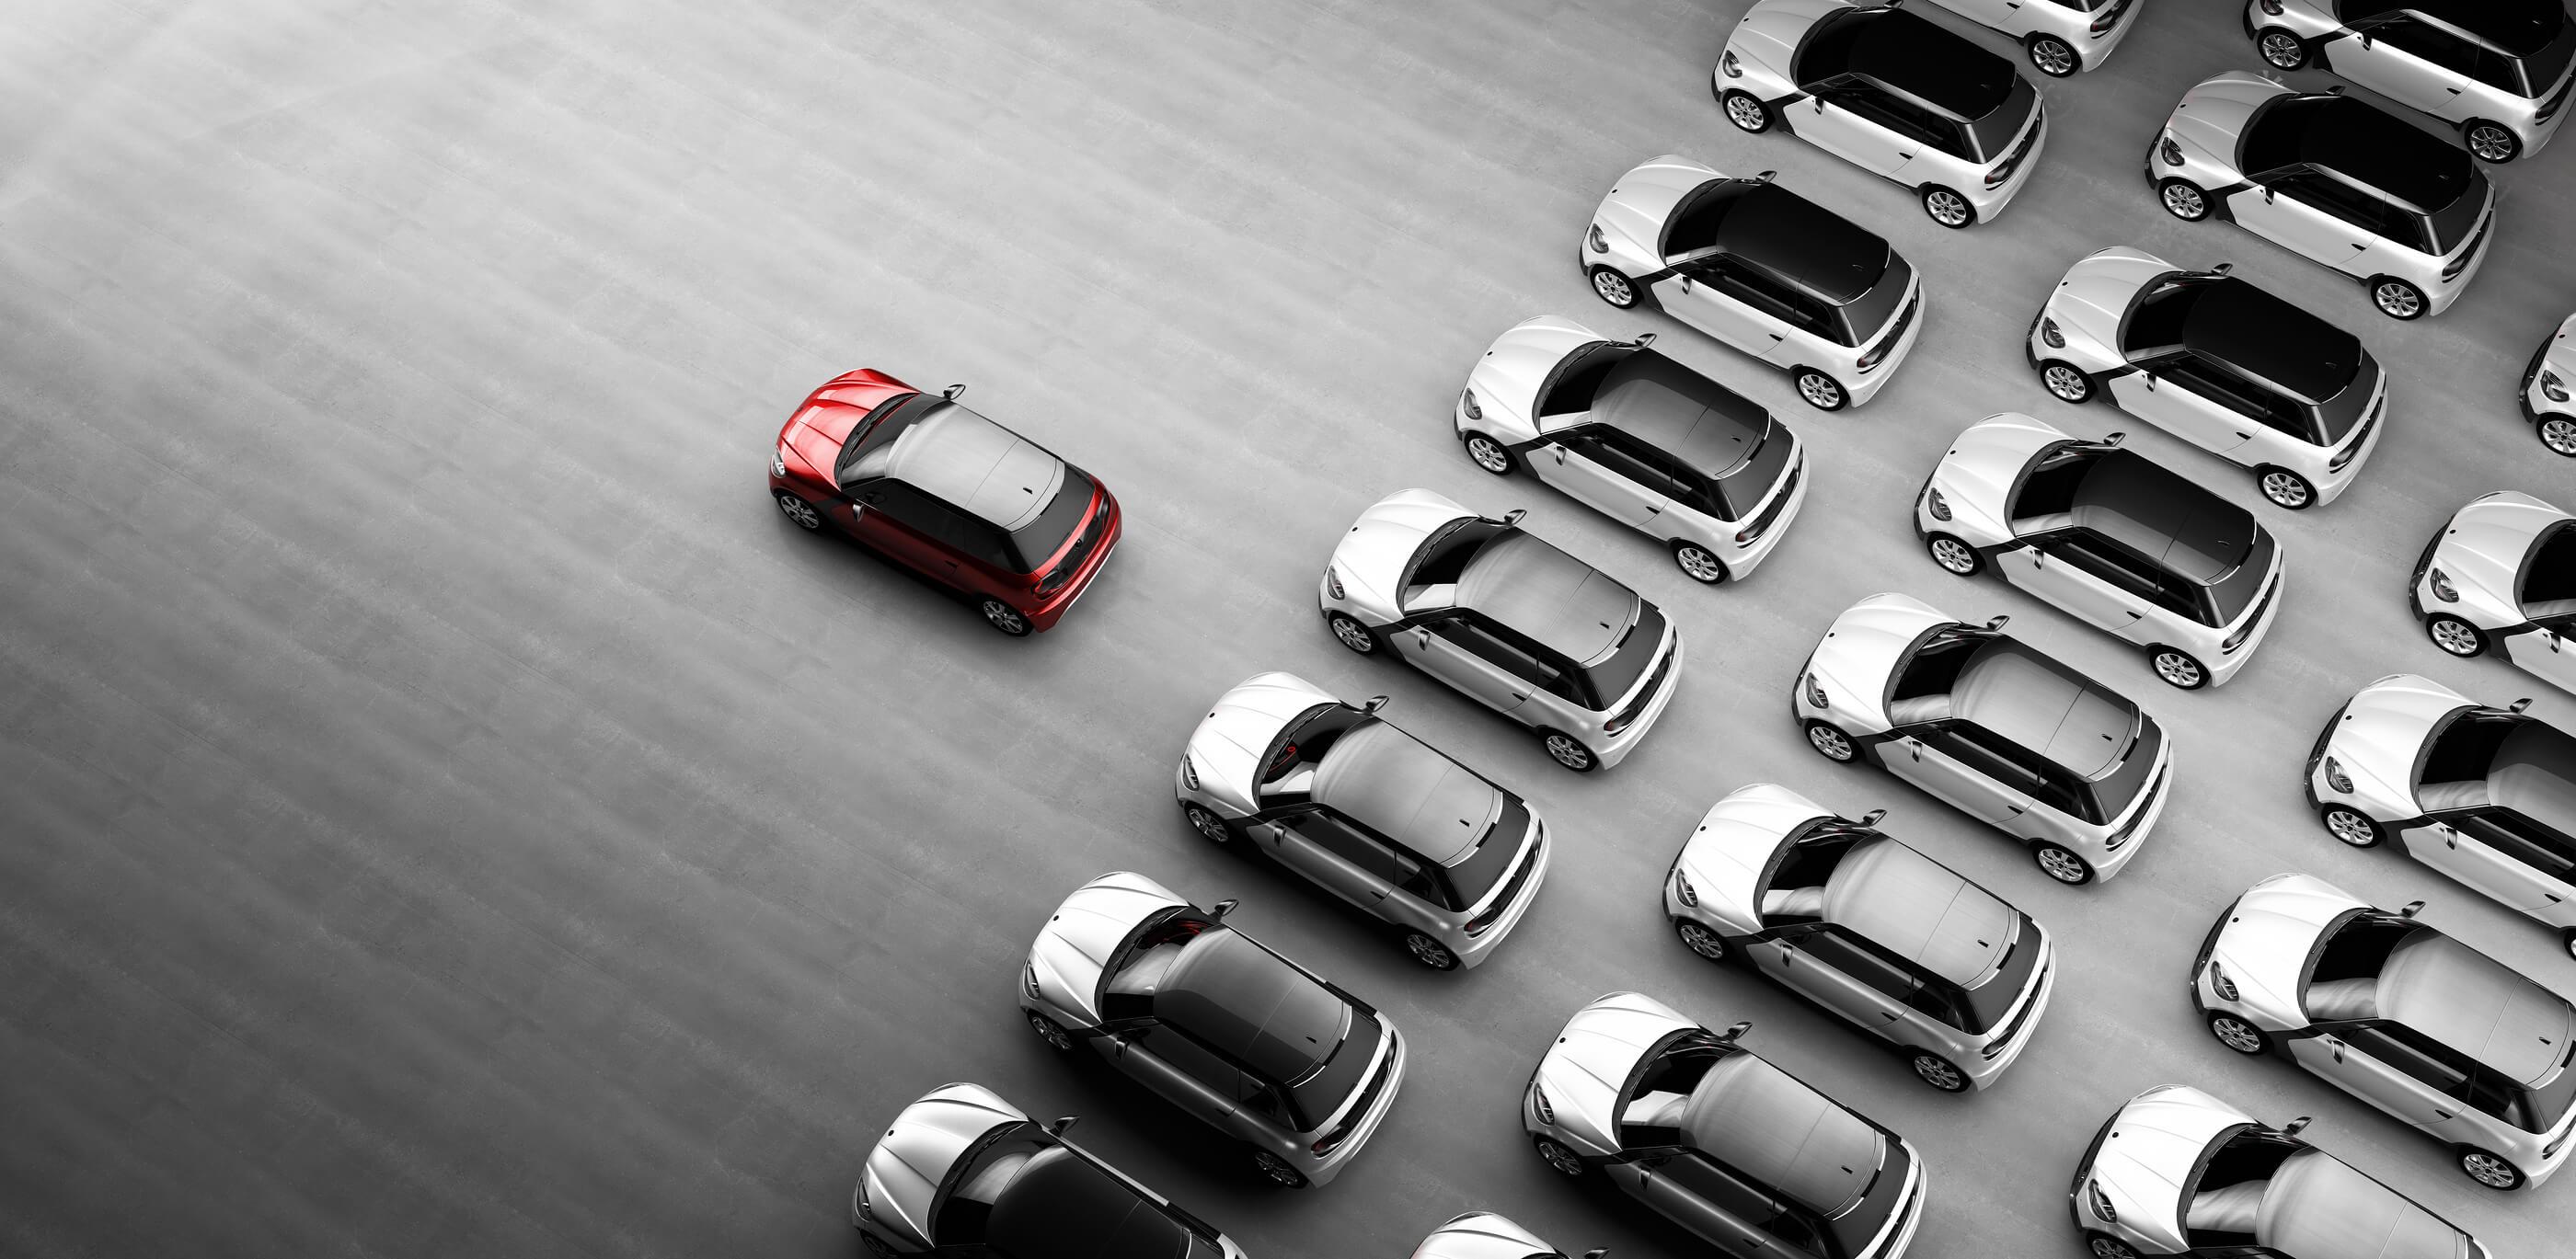 bigstock-small-city-cars-fleet-a-red-c-333236878-1